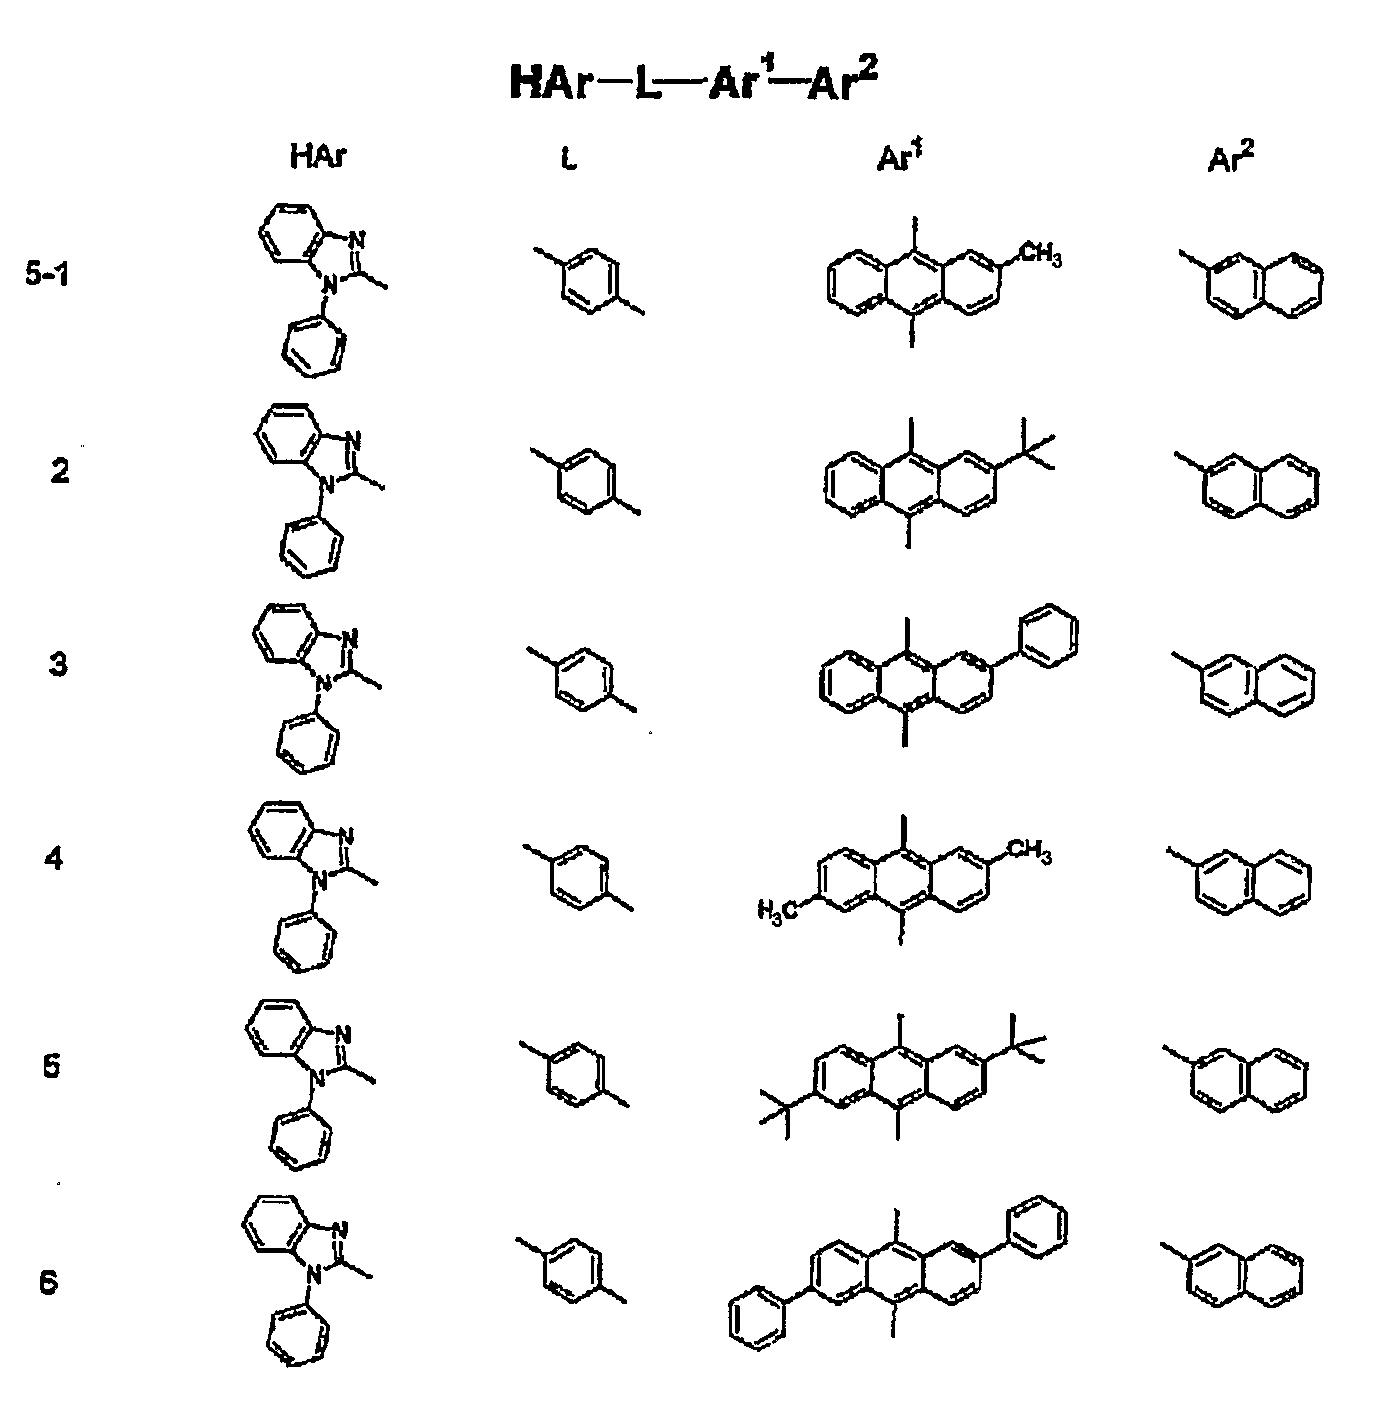 Figure WO-DOC-CHEMICAL-52